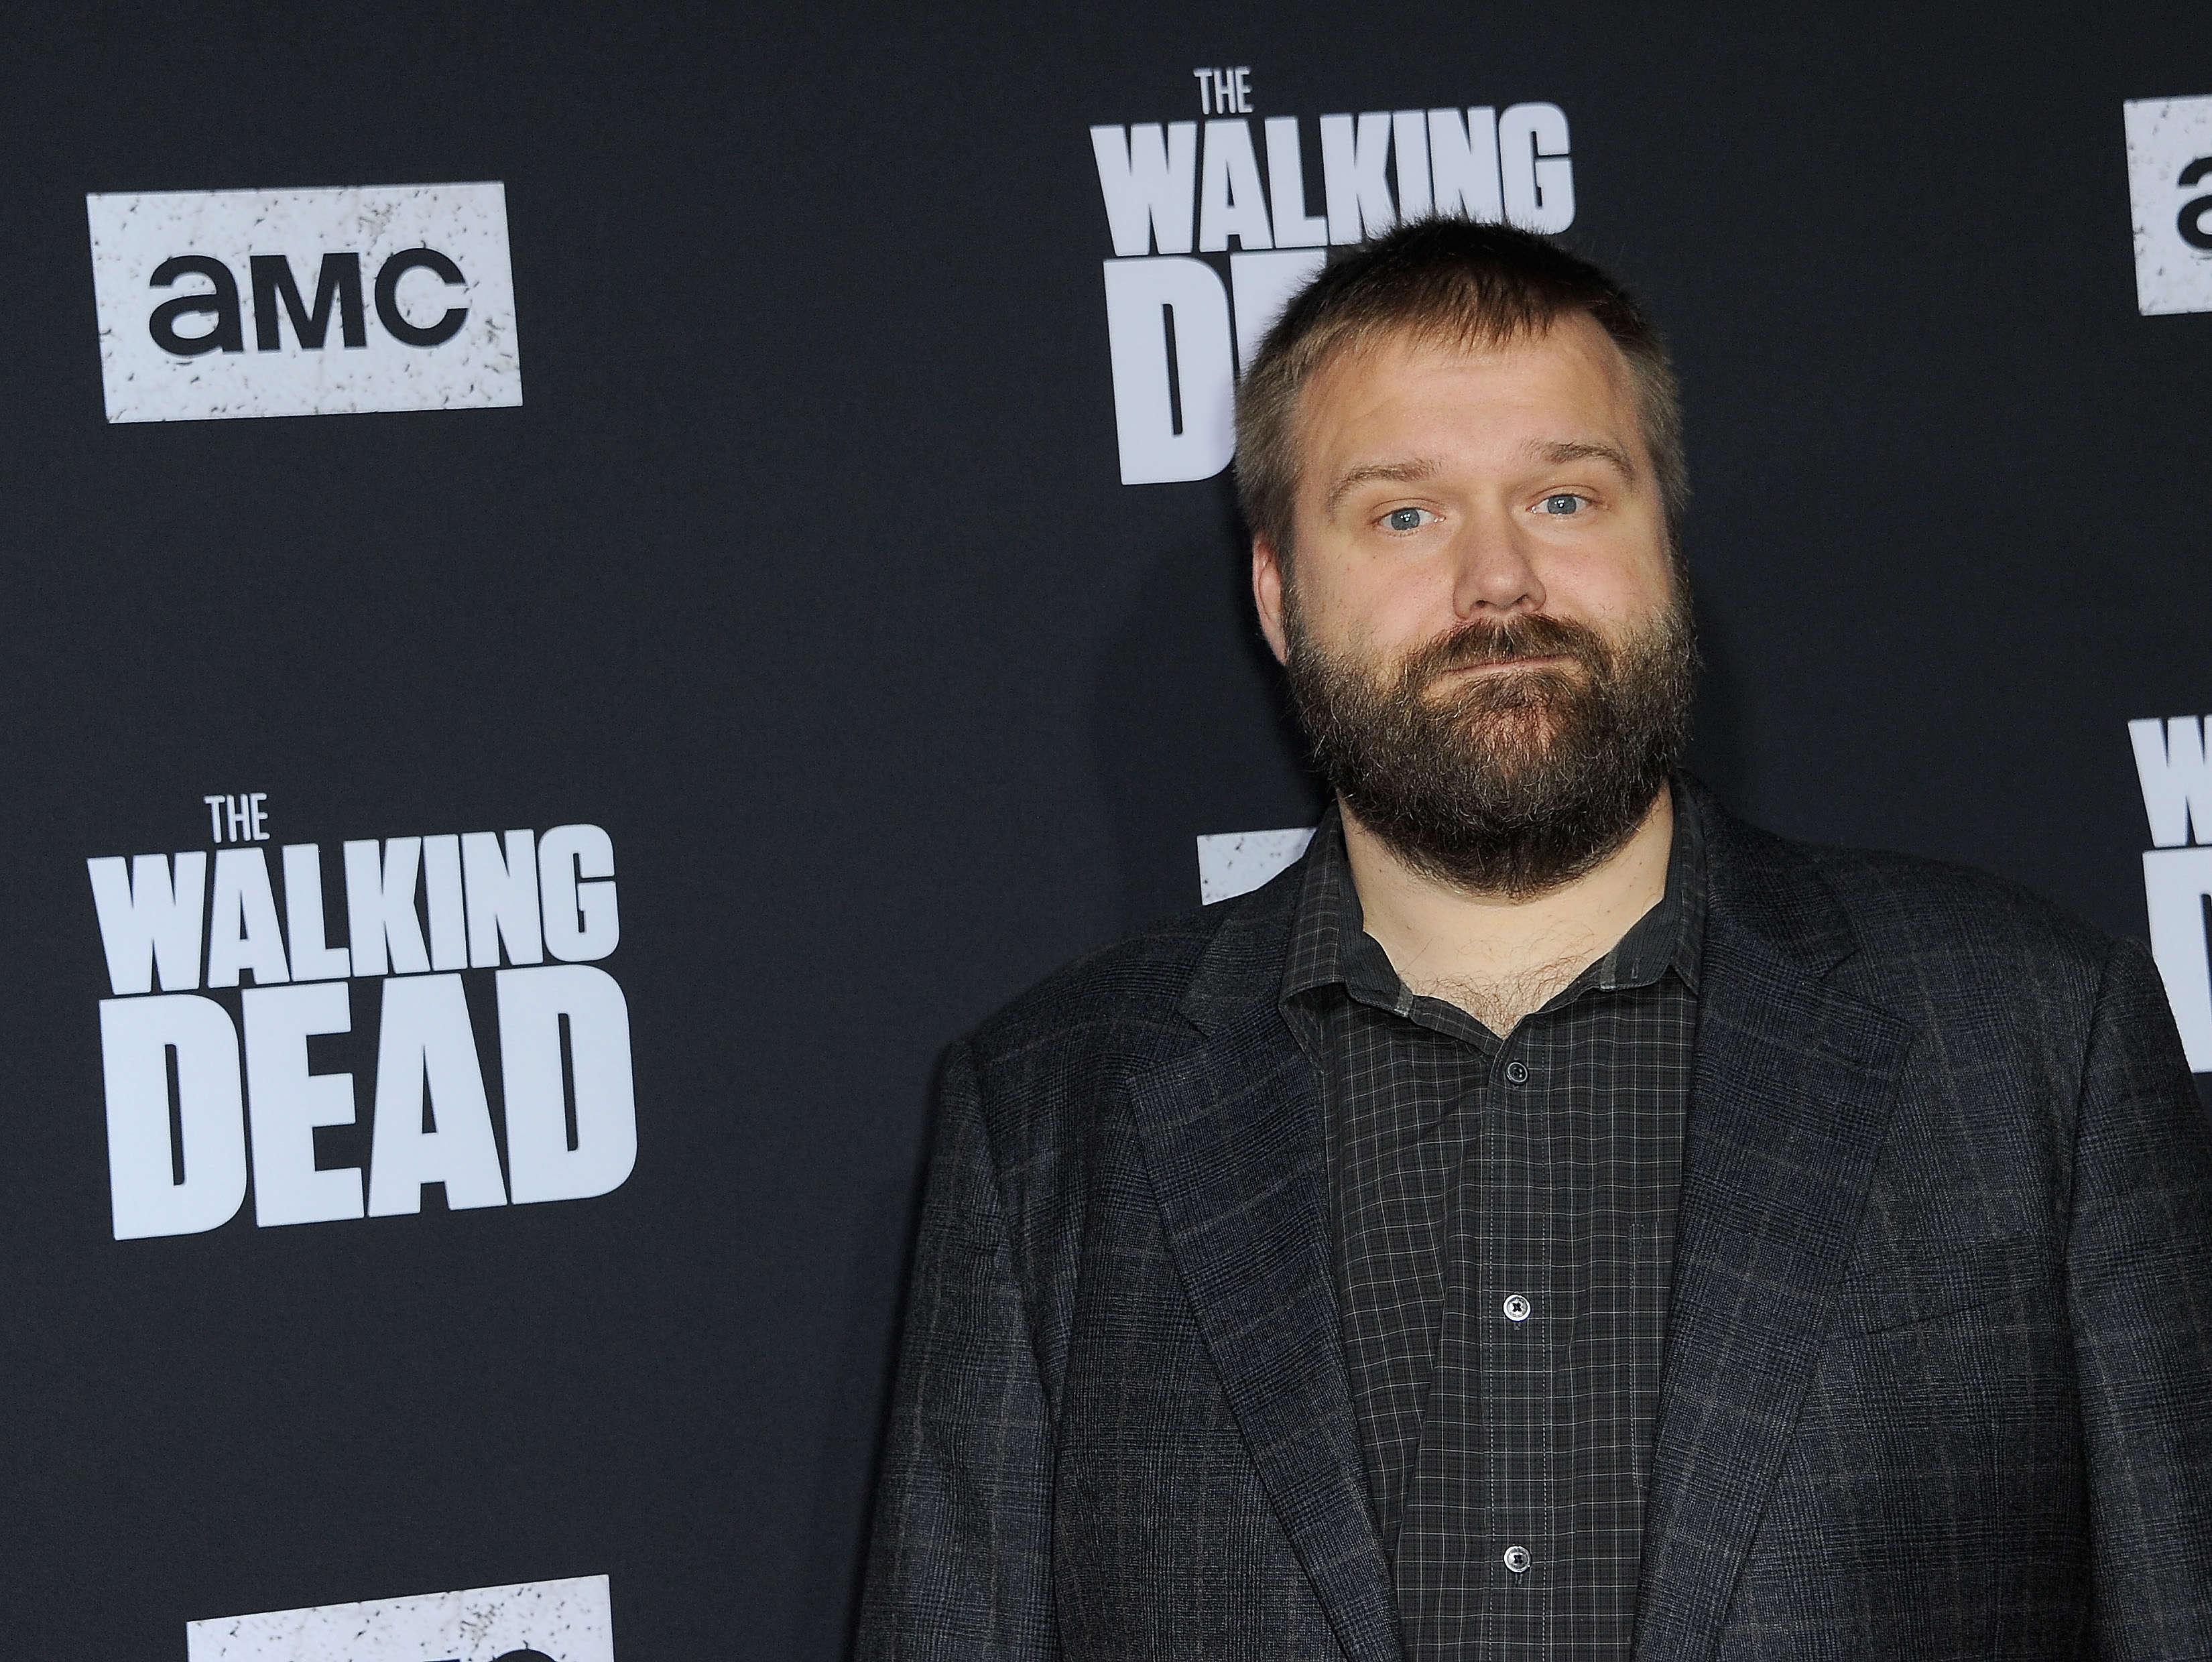 Robert Kirkman teases Invincible S2, new Dracula sidekick movie Renfield, and 'lots more Walking Dead'